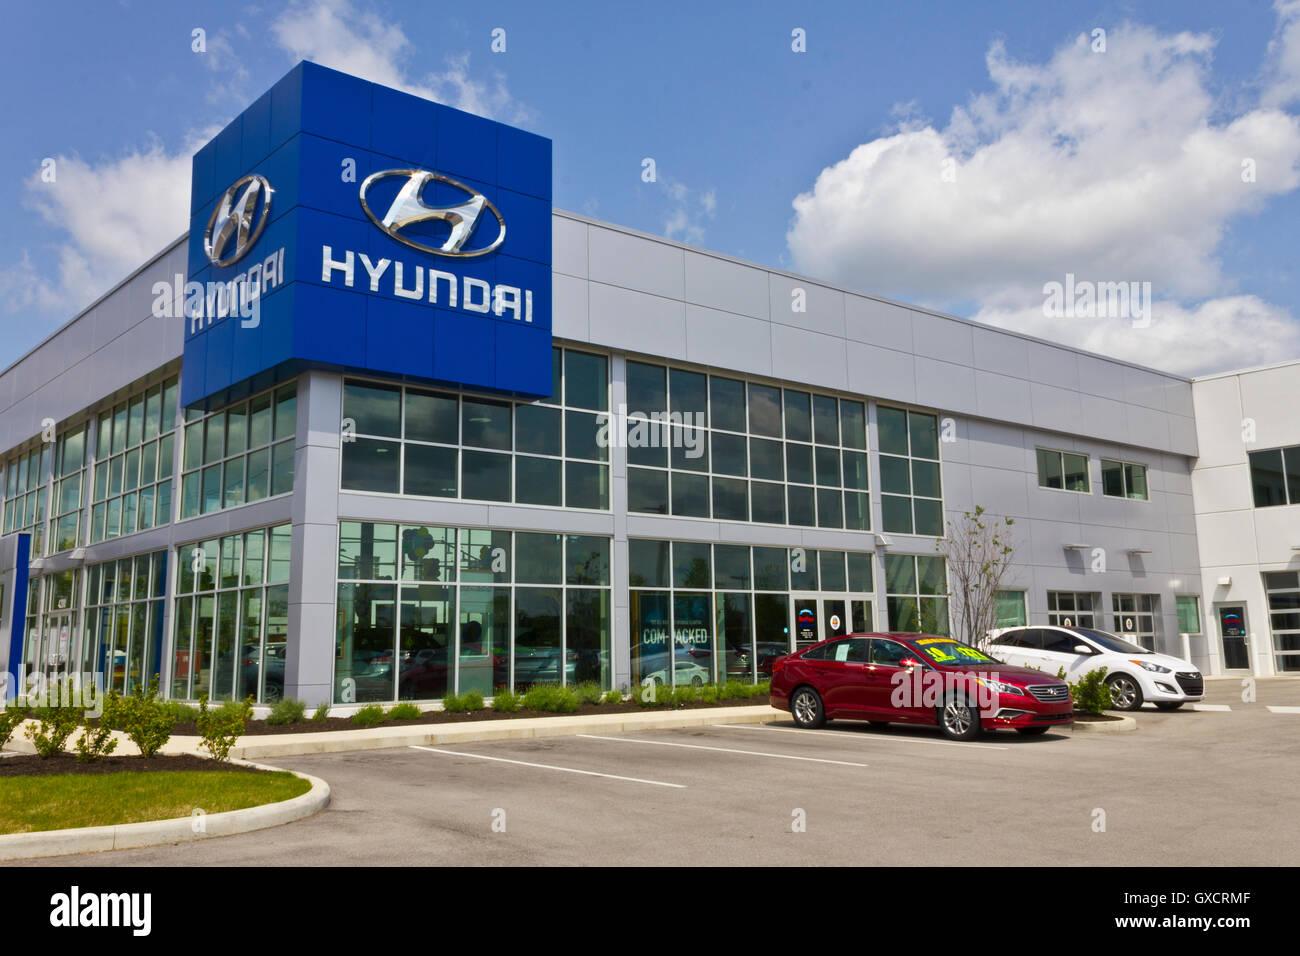 Hyundai Dealership Indianapolis >> Hyundai Dealership Stock Photos Hyundai Dealership Stock Images